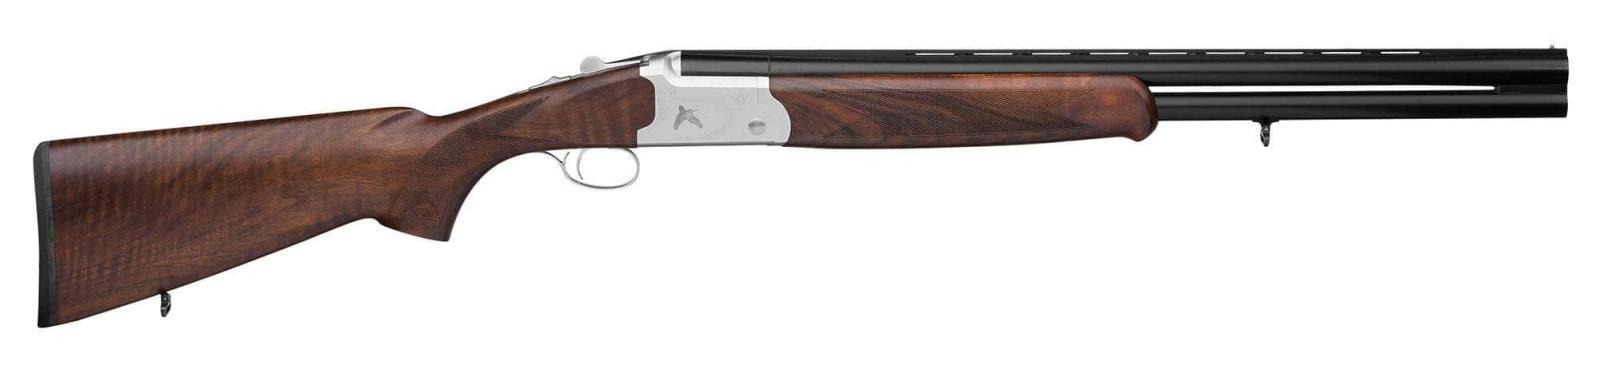 Fusil superposé DECASTEL Bécassier MC171 Cal 12/76